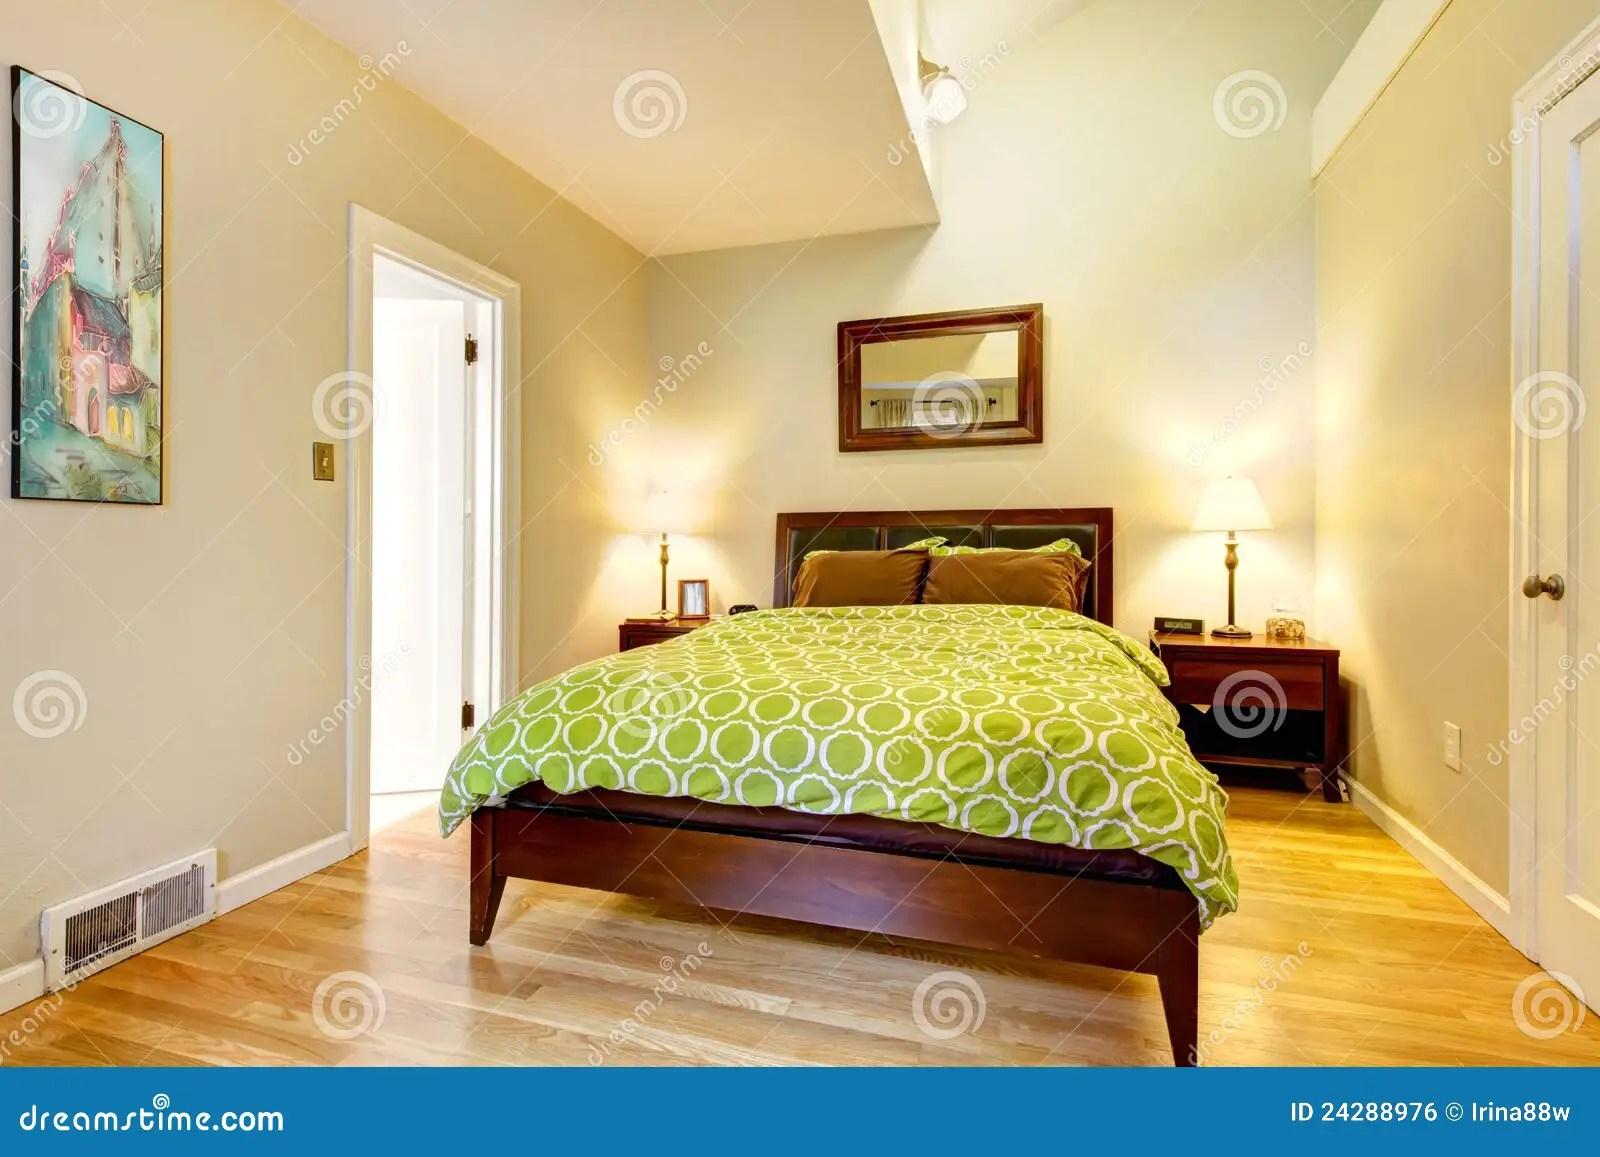 Moderne Groene En Beige Slaapkamer Met Bruin Bed Stock